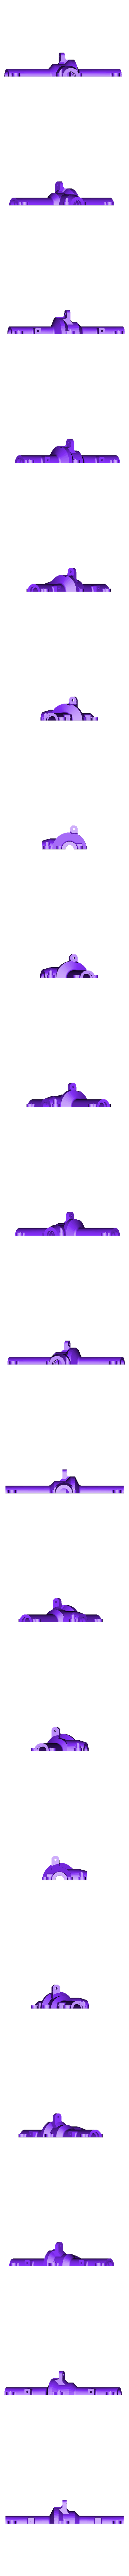 TruckV3_Axle2_rear_top_single.STL Download STL file 3D Printed RC Truck V3 • 3D print model, MrCrankyface